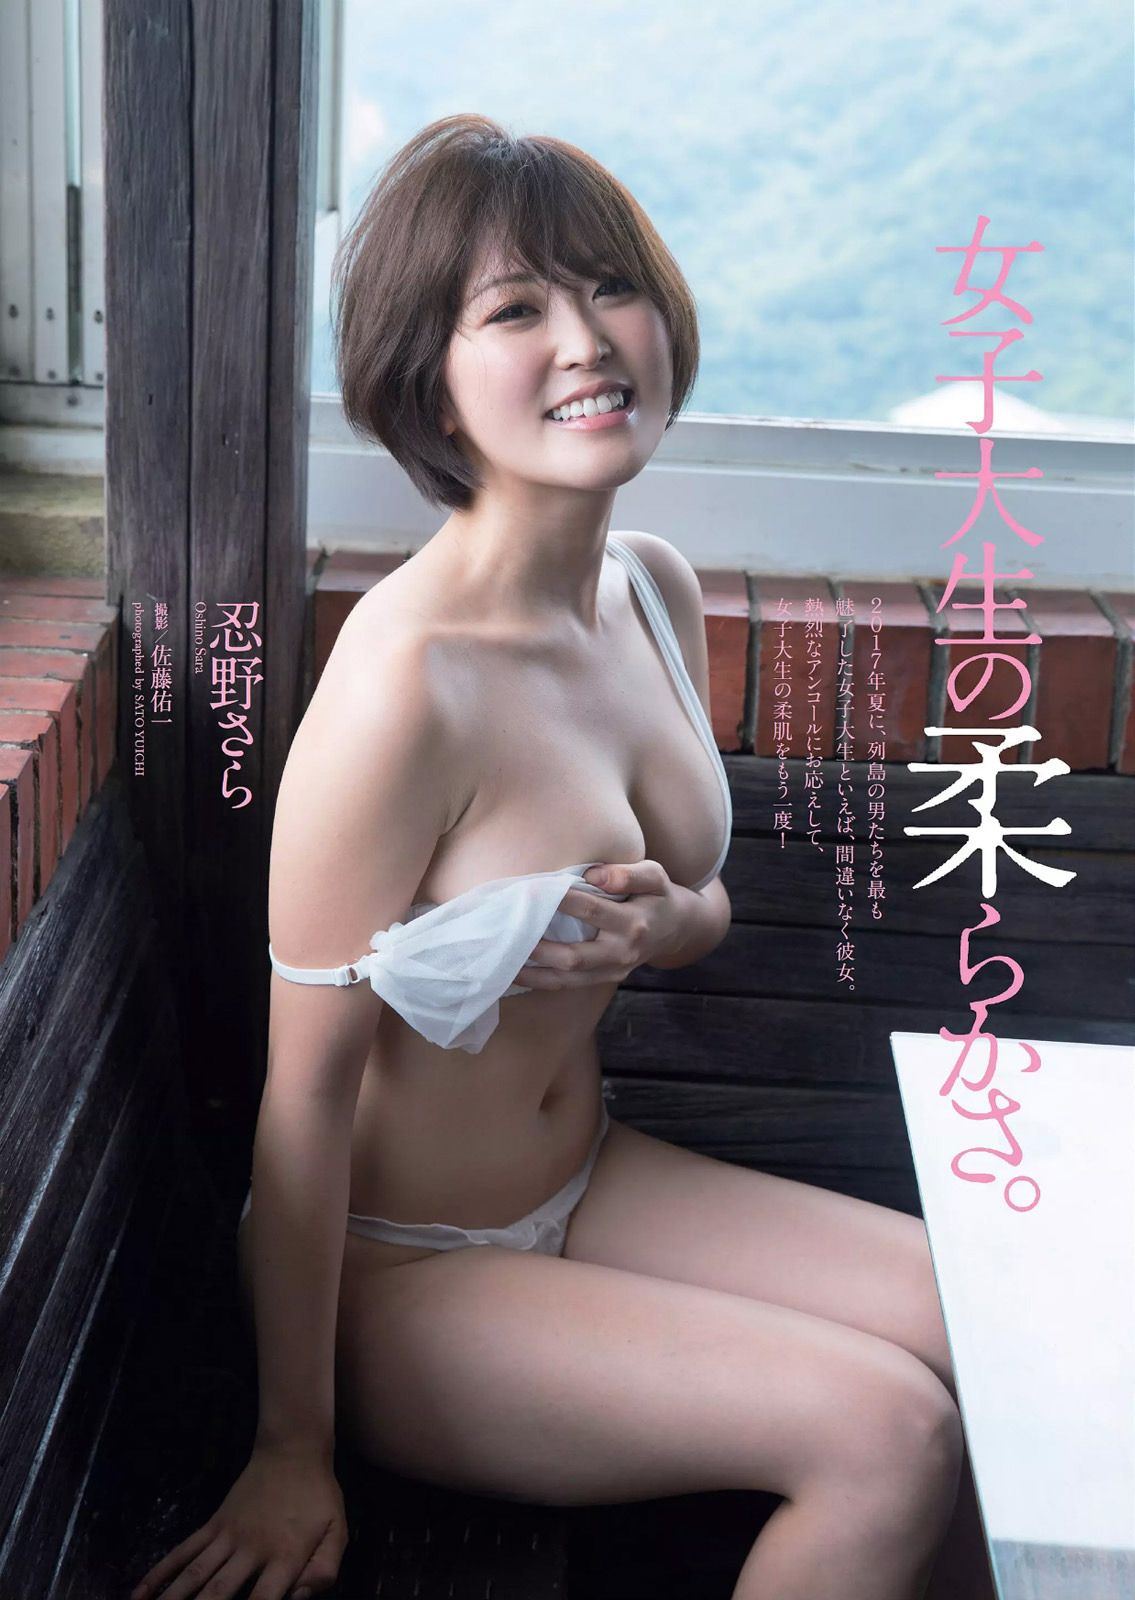 Sexy asian girl japanese idol